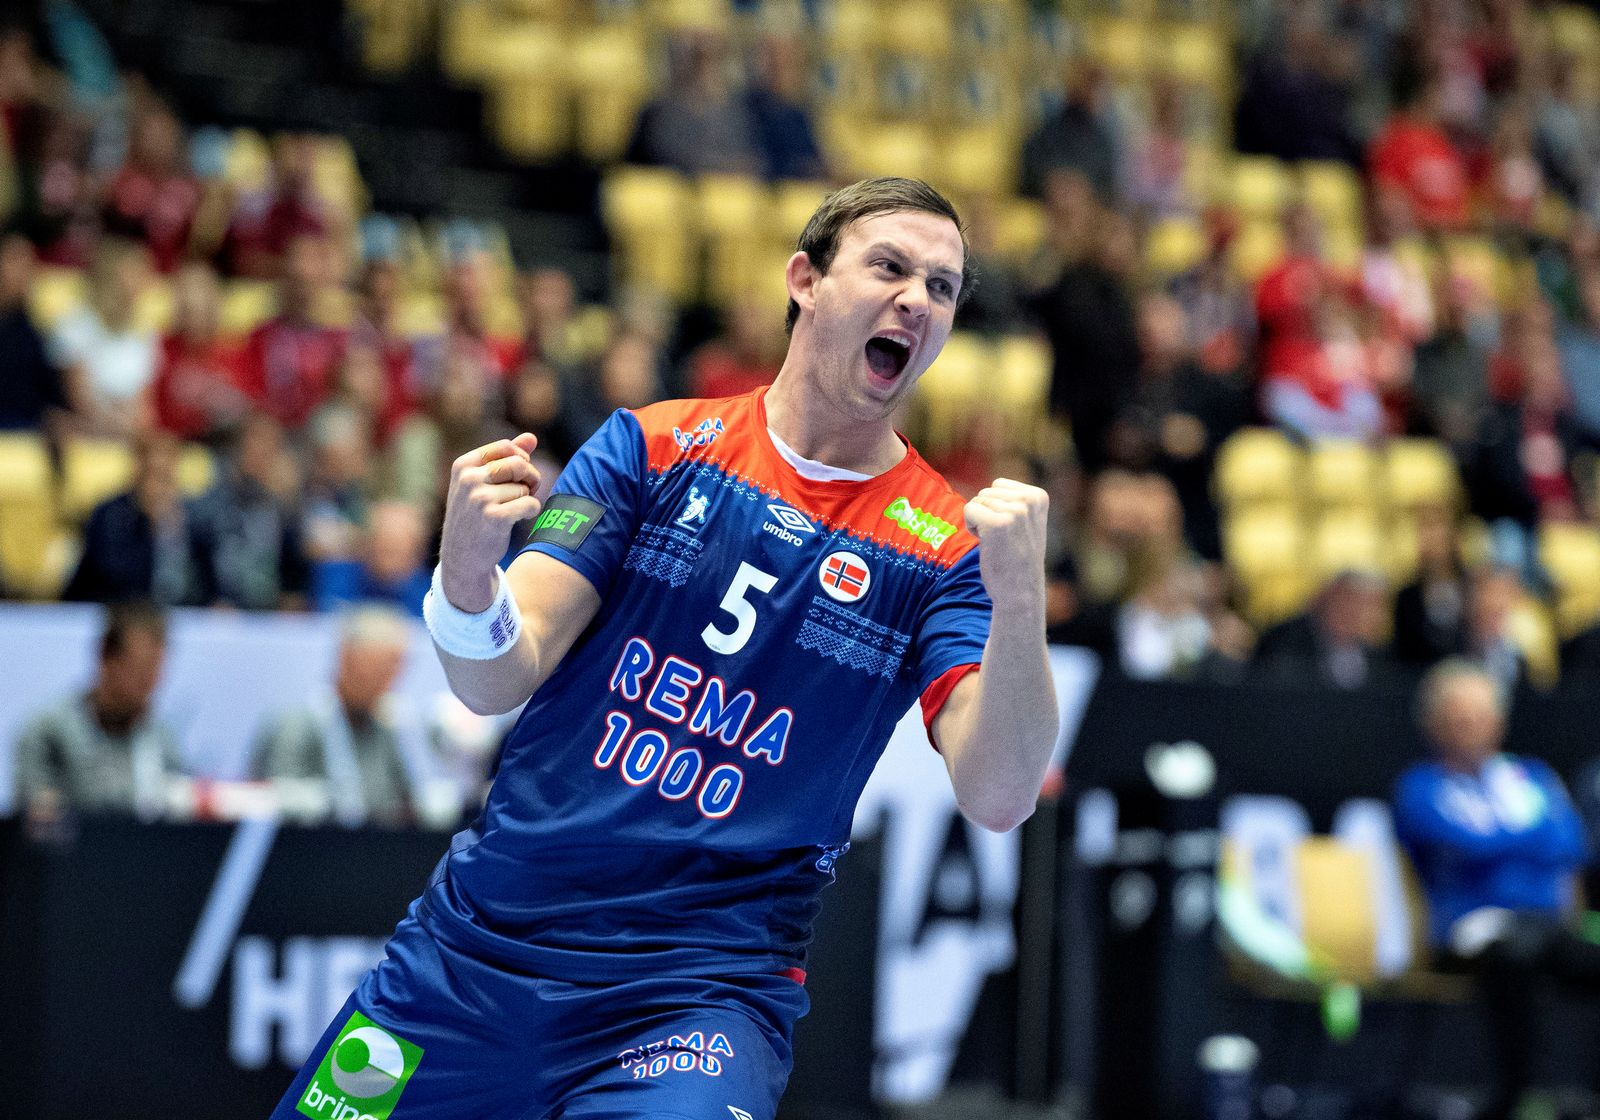 IHF Handball World Championship - Germany & Denmark 2019 - Group C - Norway v Austria